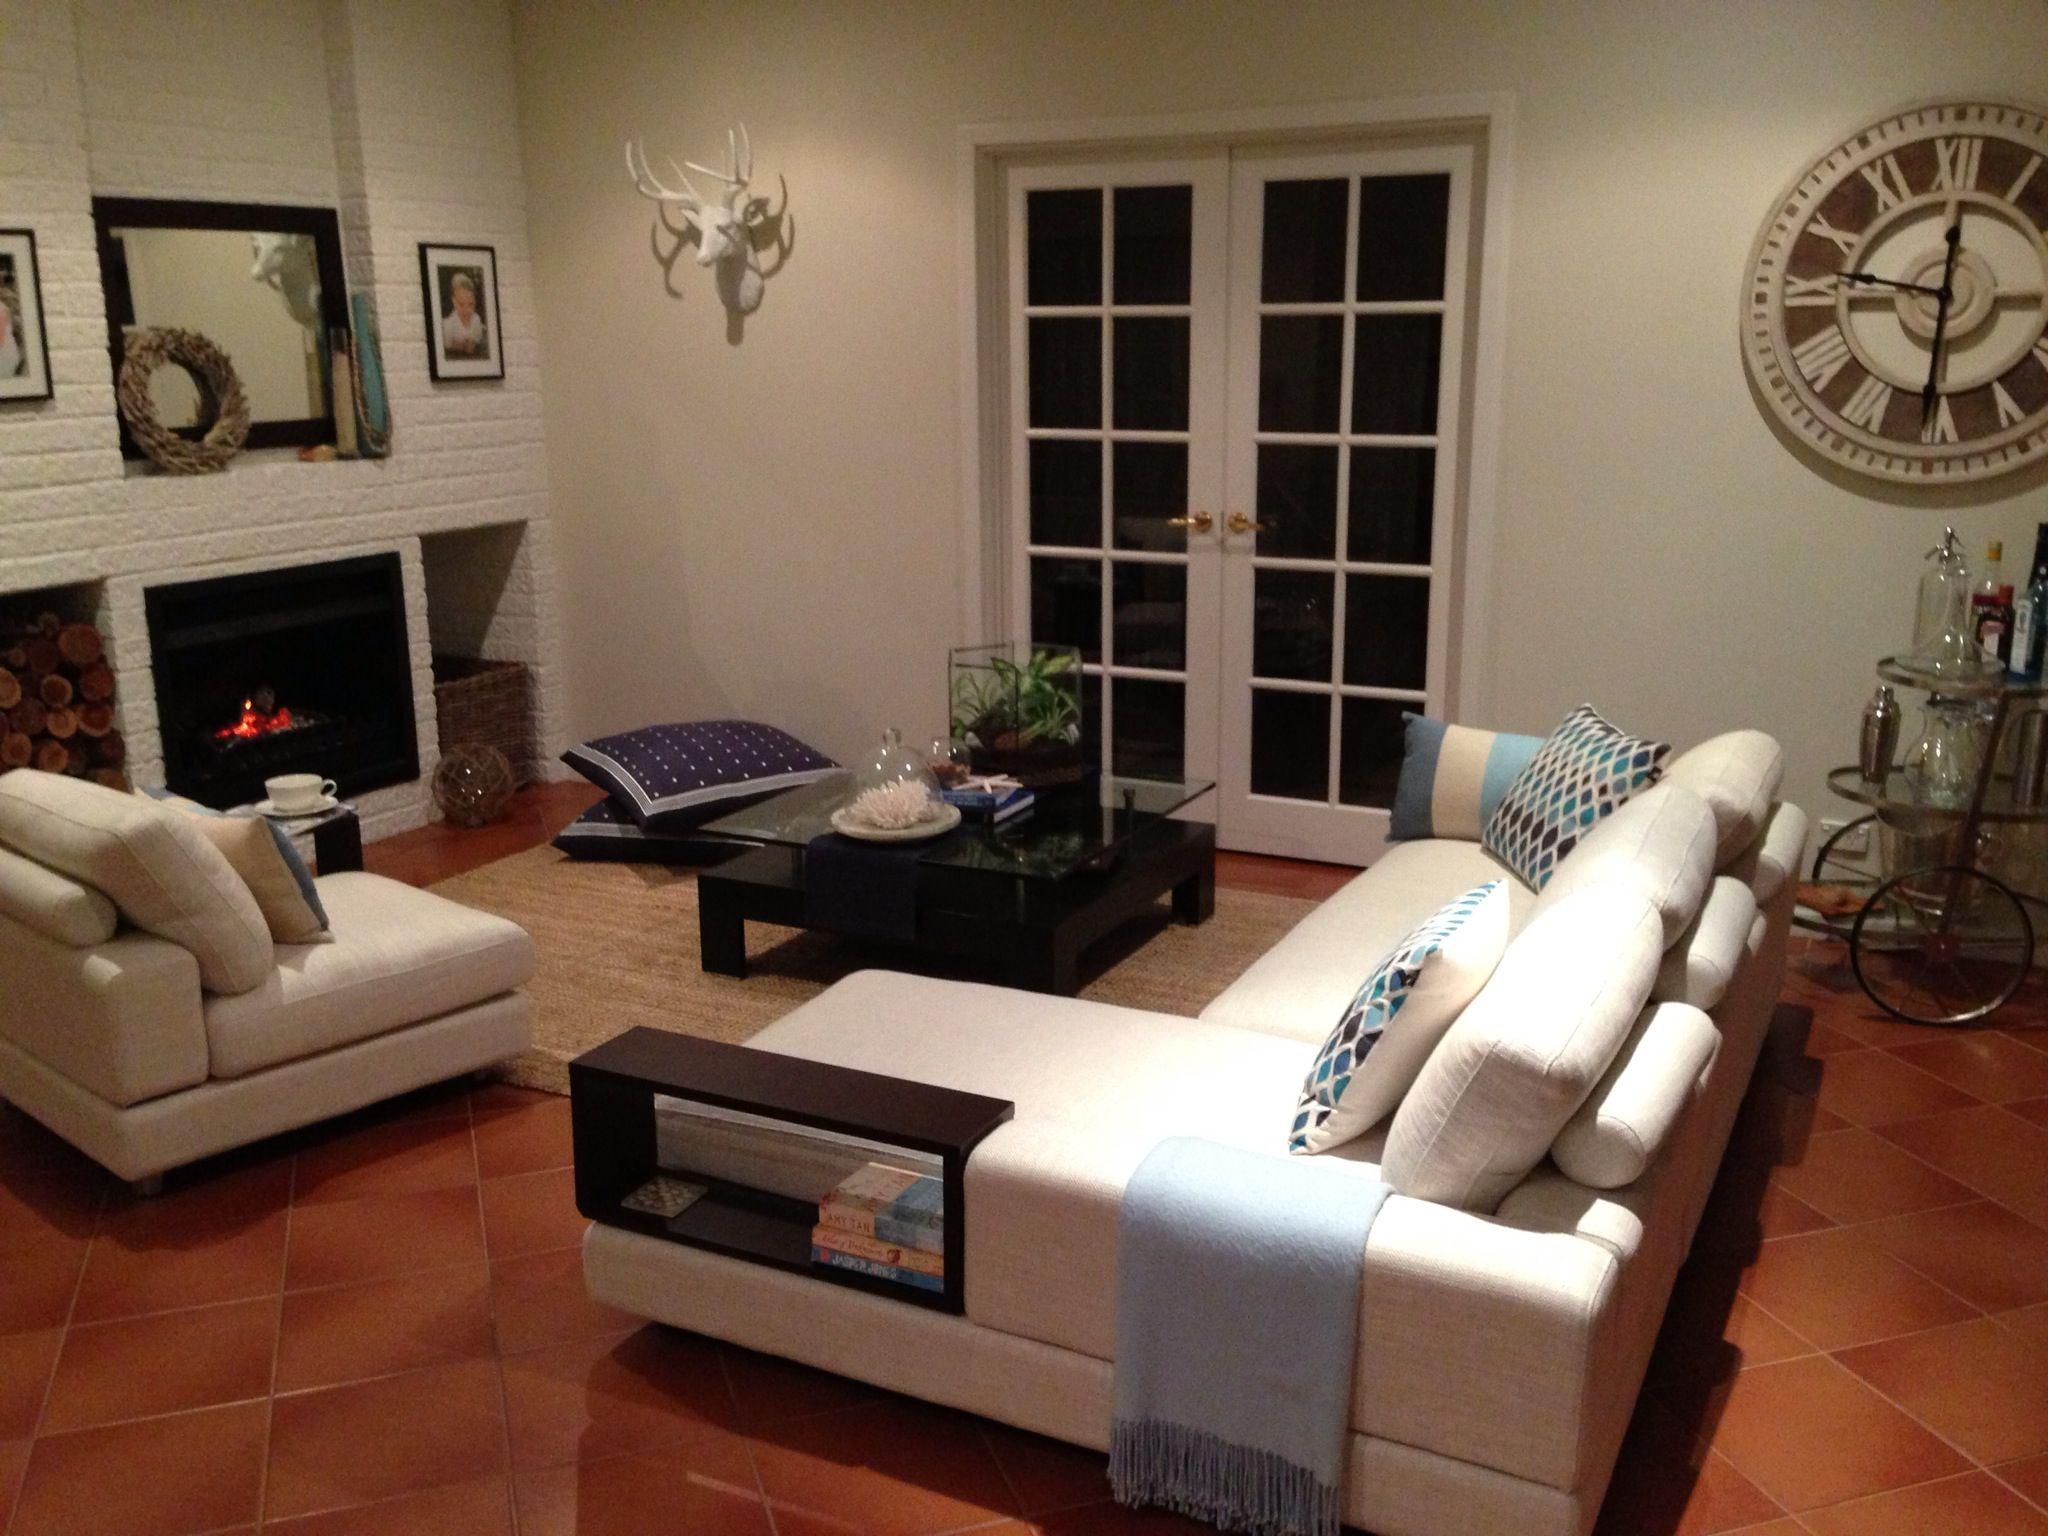 Baby jasper bed brackets - Baby Jasper King Furniture White Brick Fireplace Large Clock Wenge And White